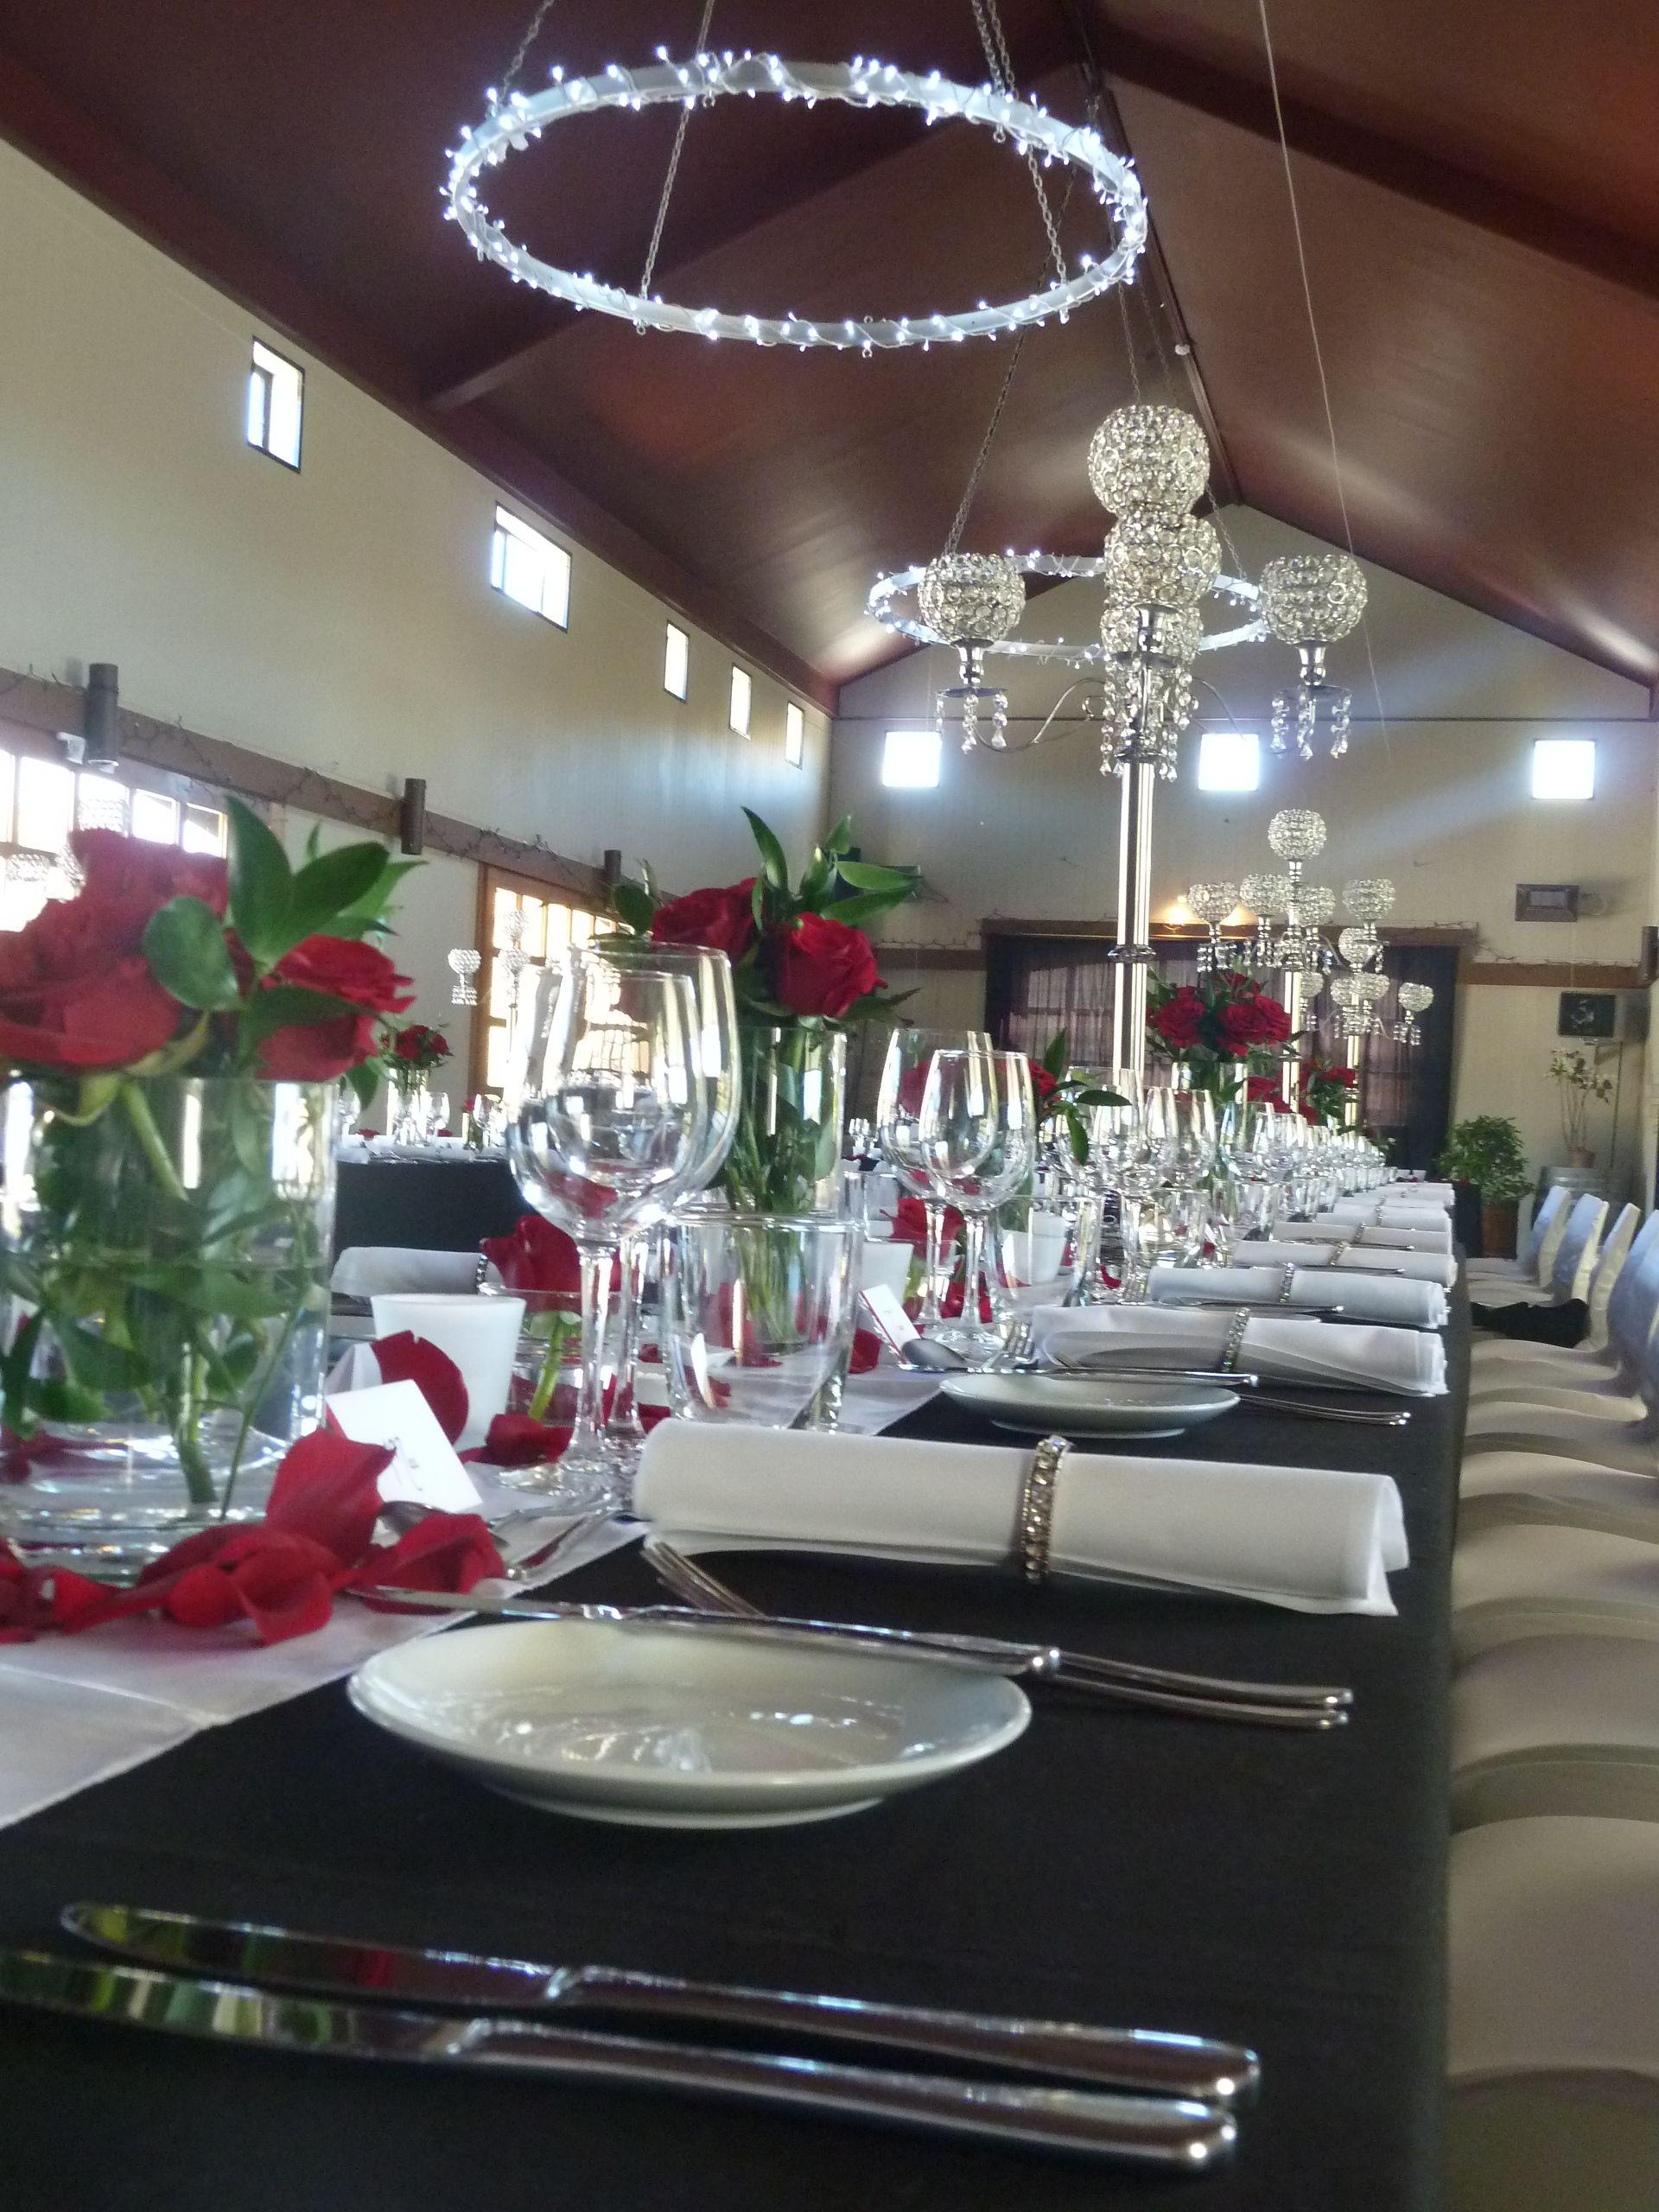 Venue for hire mobile 0274956221 ed wedding venues queenstown venue for hire mobile 0274956221 ed junglespirit Image collections